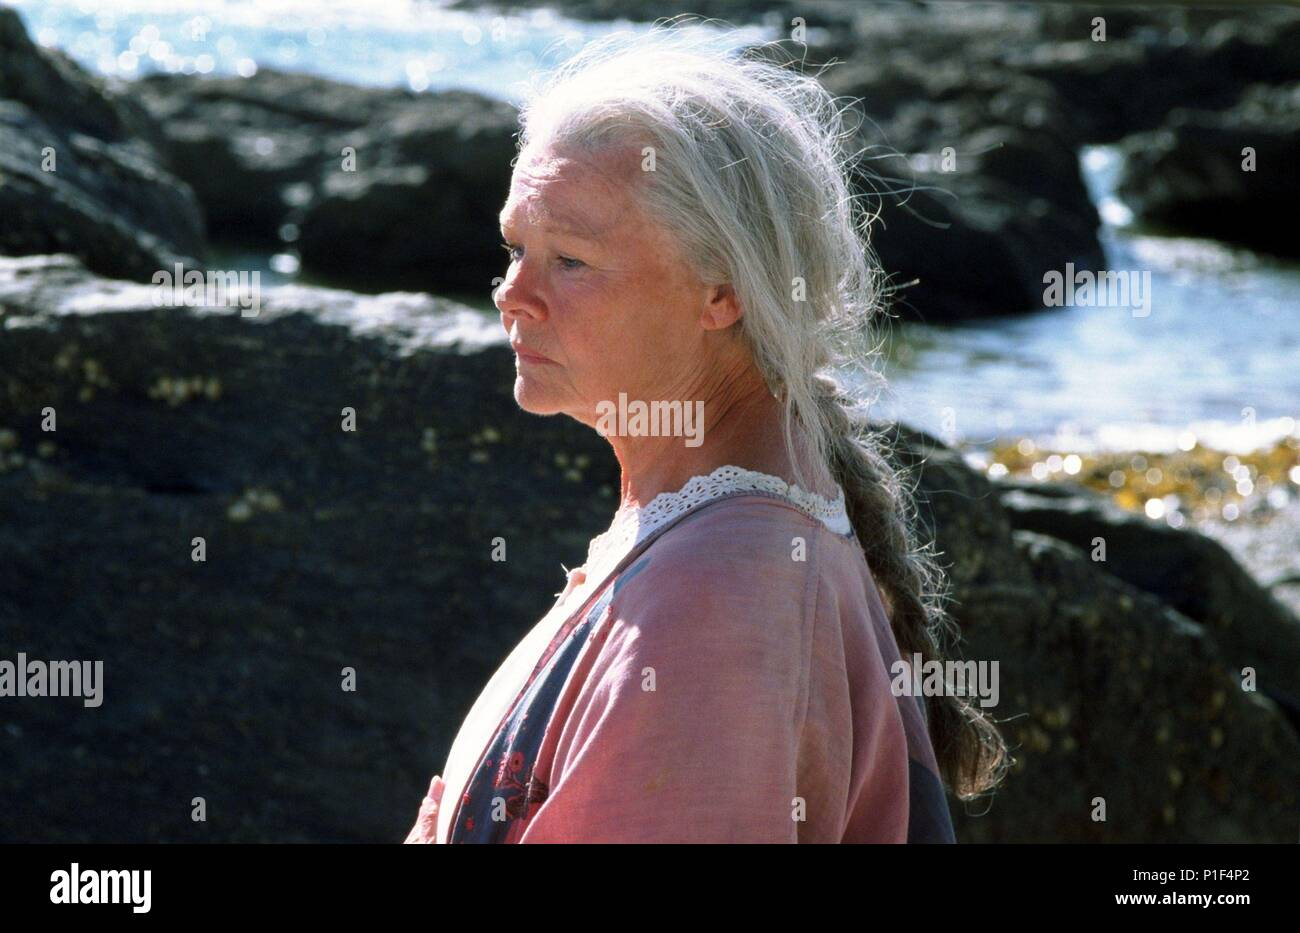 Original Film Title: LADIES IN LAVENDER.  English Title: LADIES IN LAVENDER.  Film Director: CHARLES DANCE.  Year: 2004.  Stars: JUDI DENCH. Stock Photo